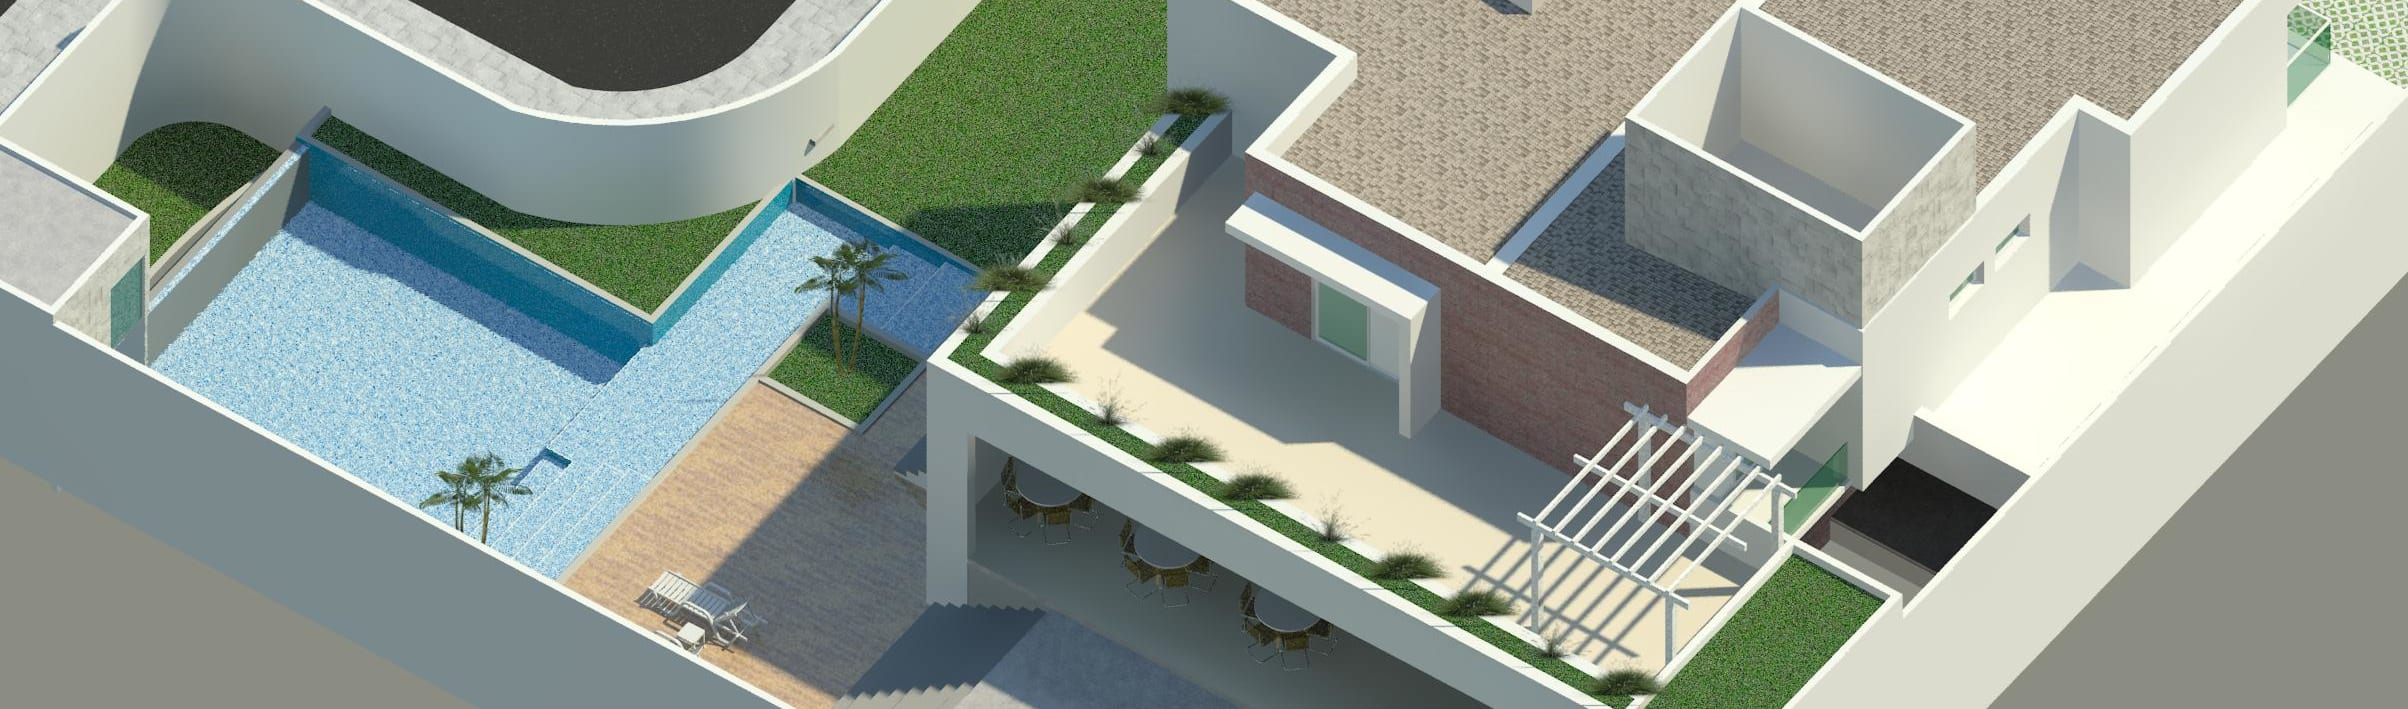 Ilton Resende Arquitetura